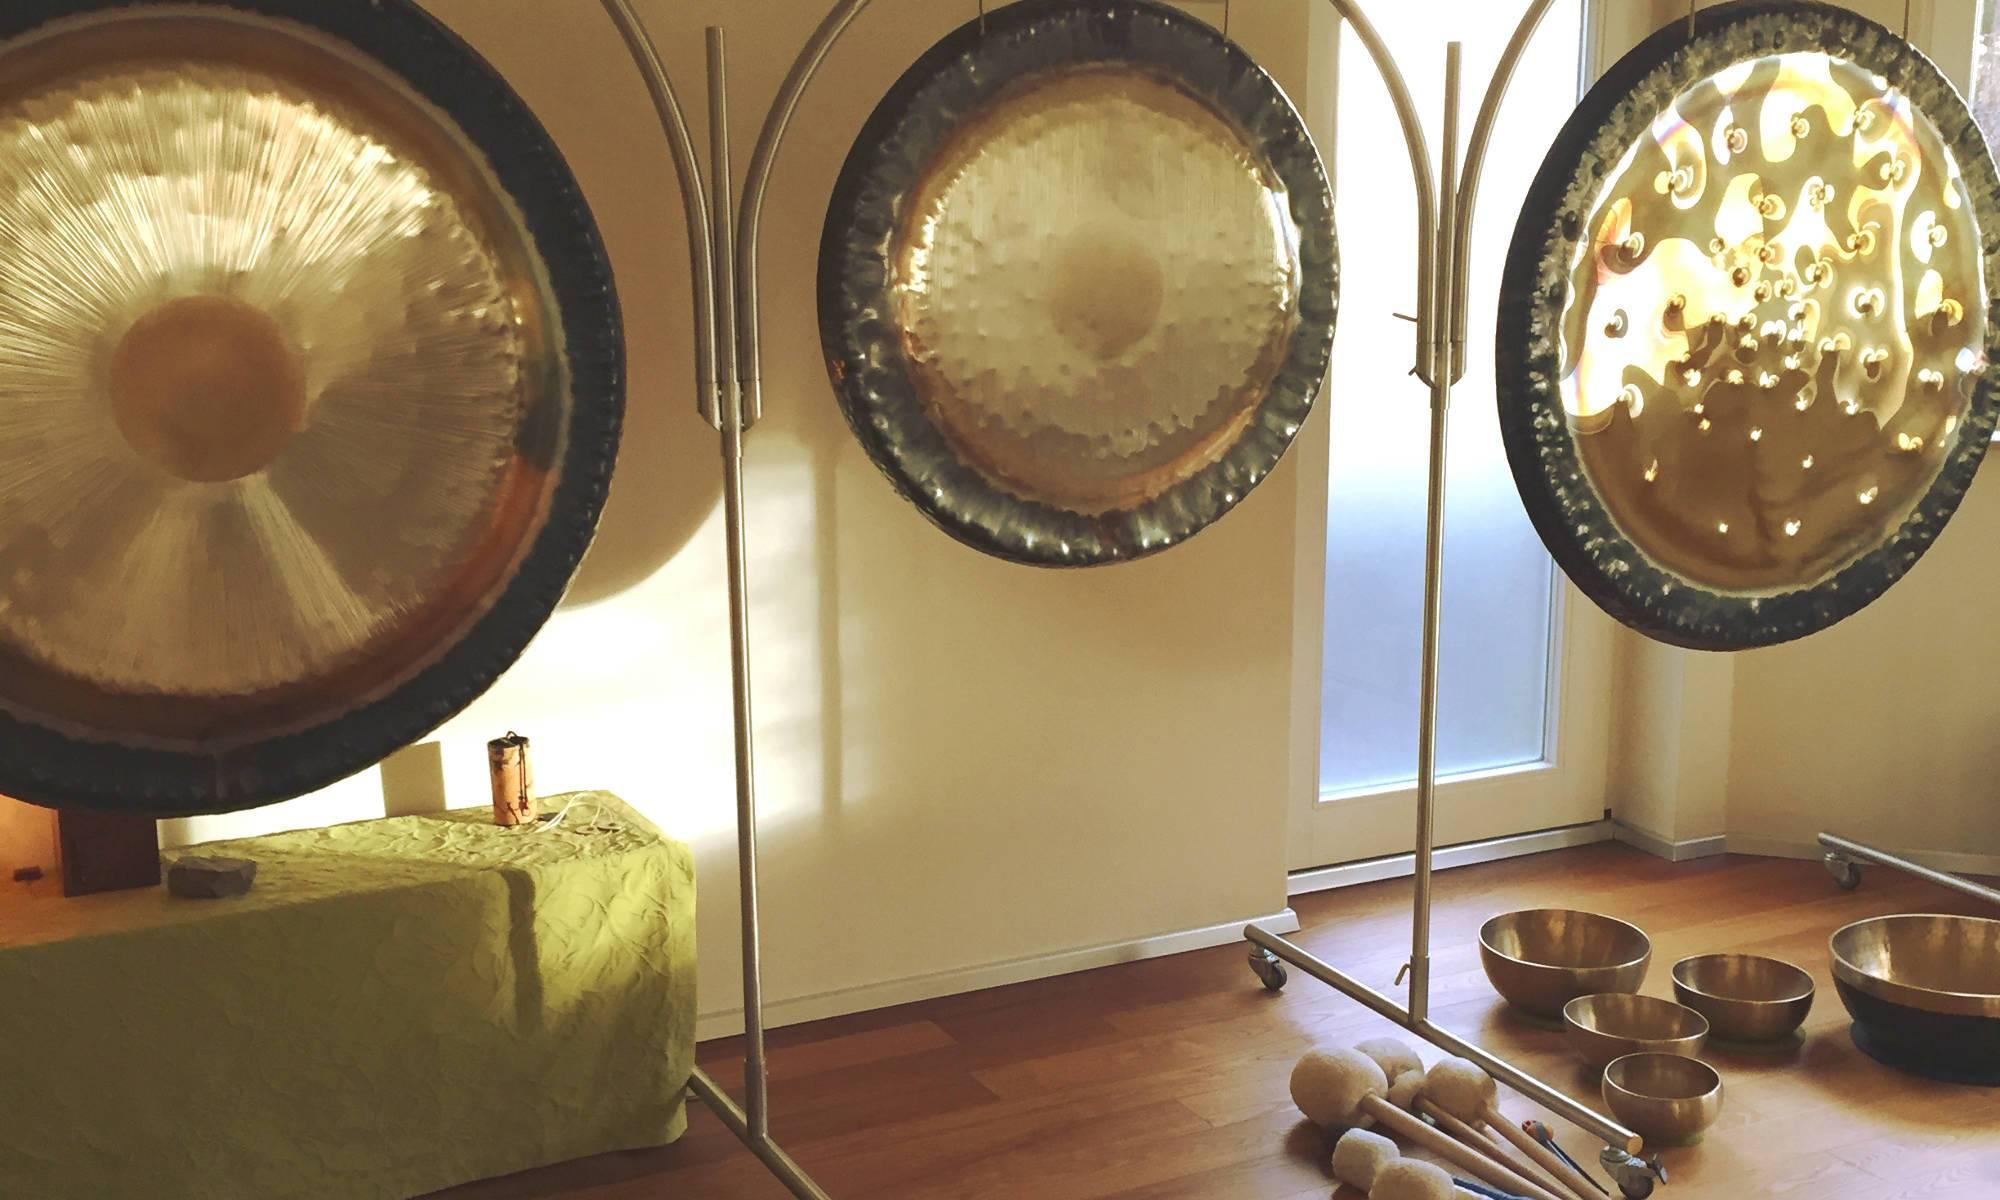 gongmeditation gong beilstein